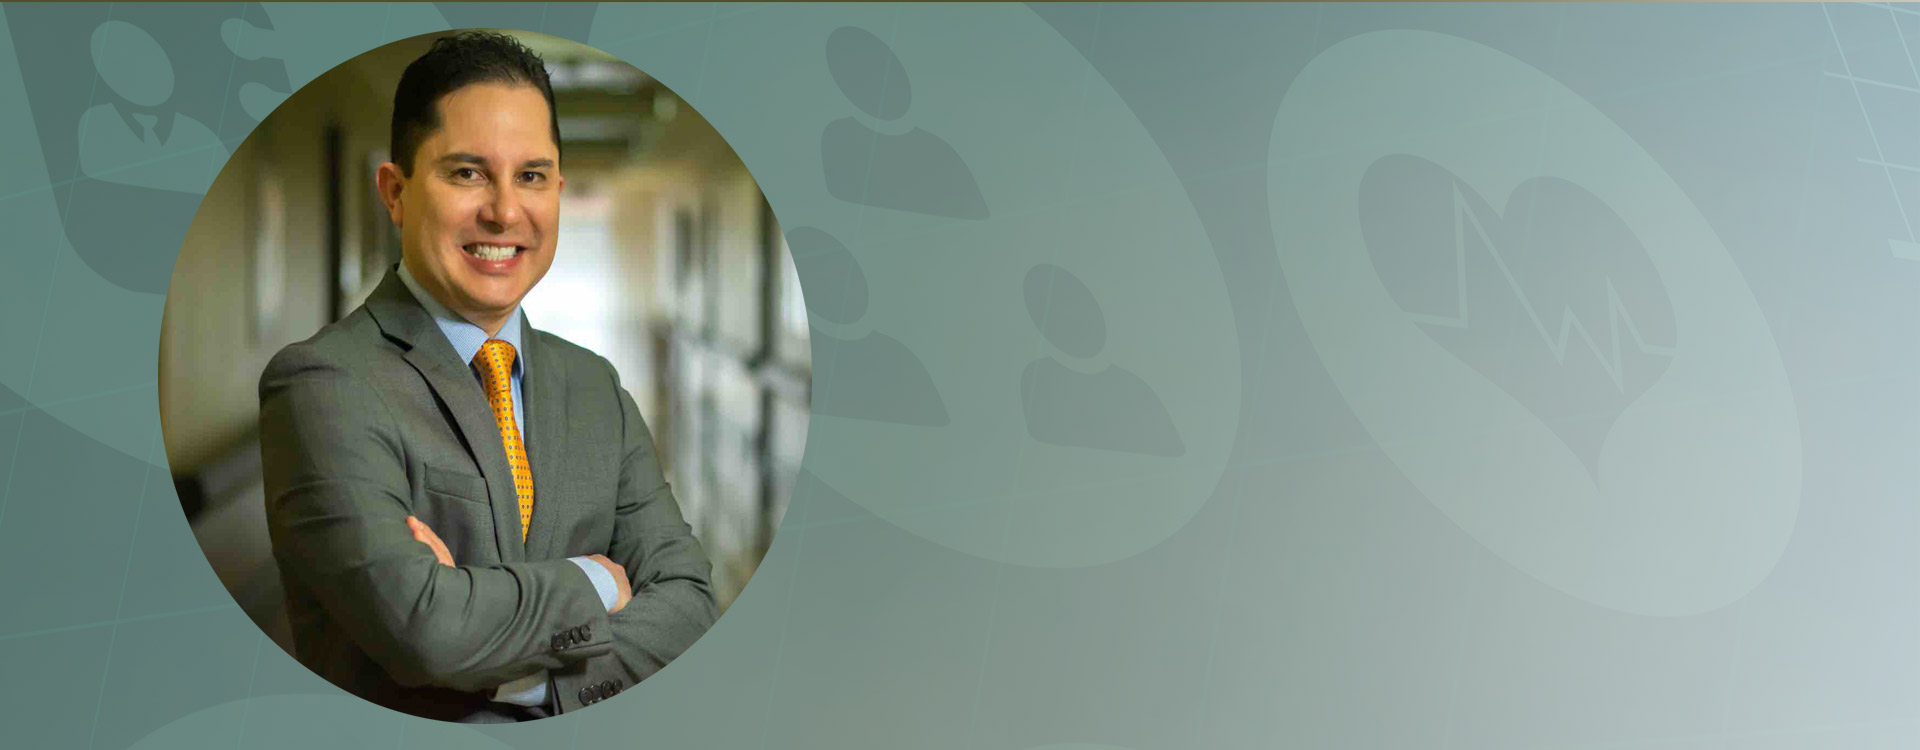 Dr. Mauricio Barahona